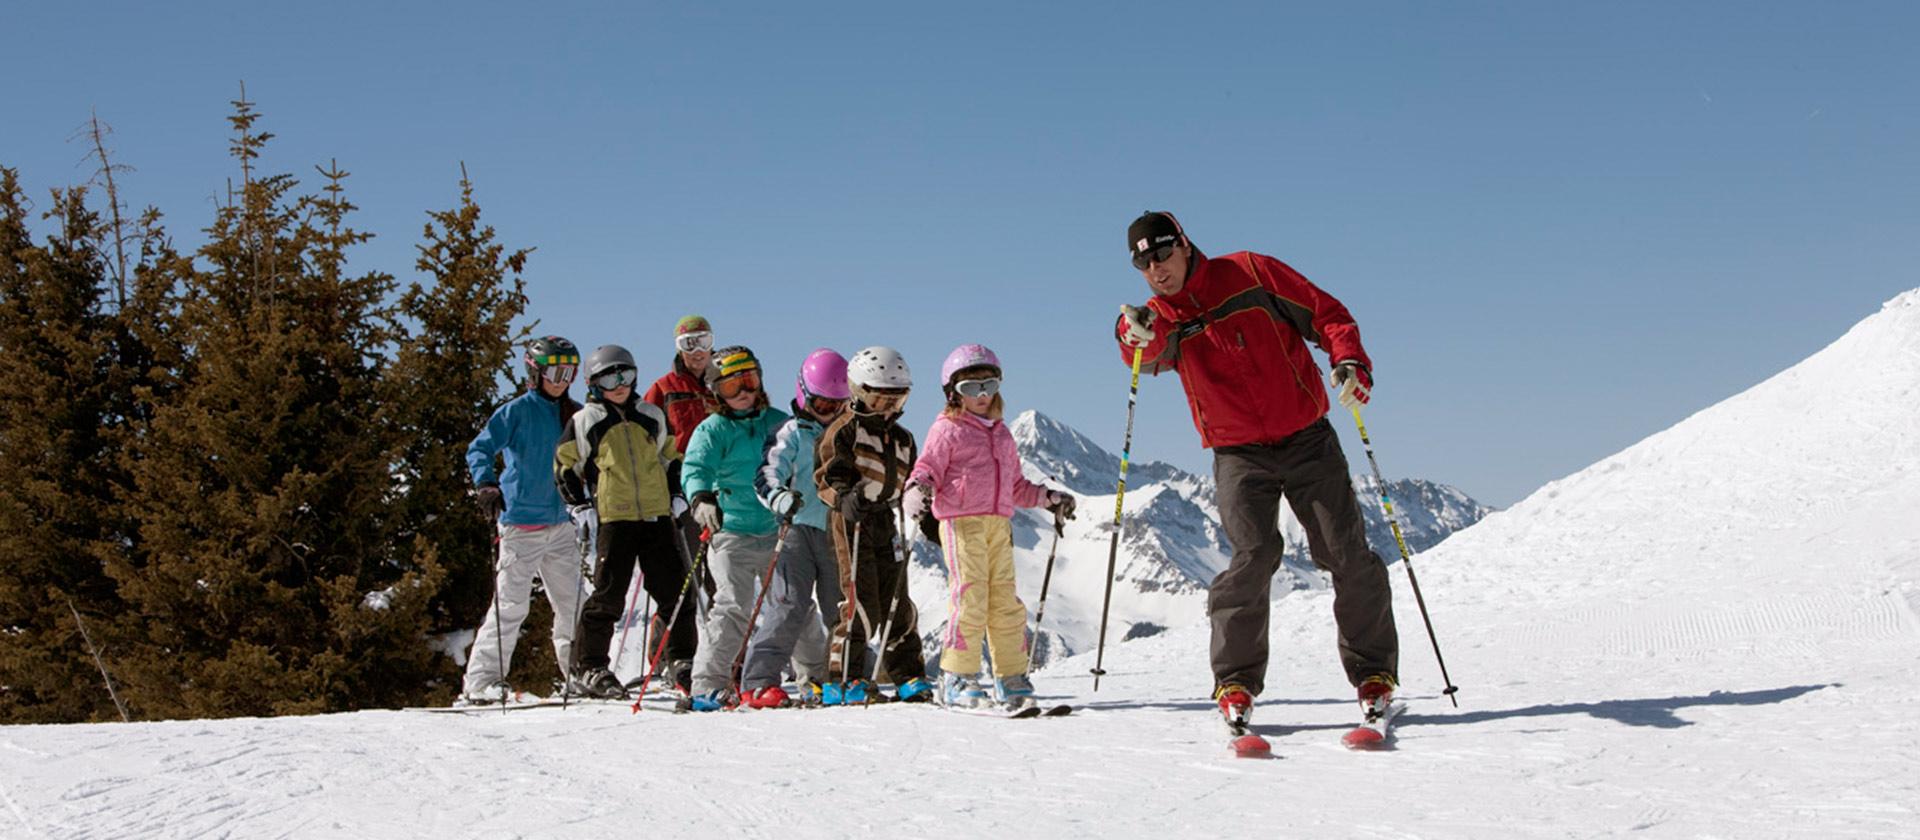 childrens-ski-school-1920x840-hero.jpg